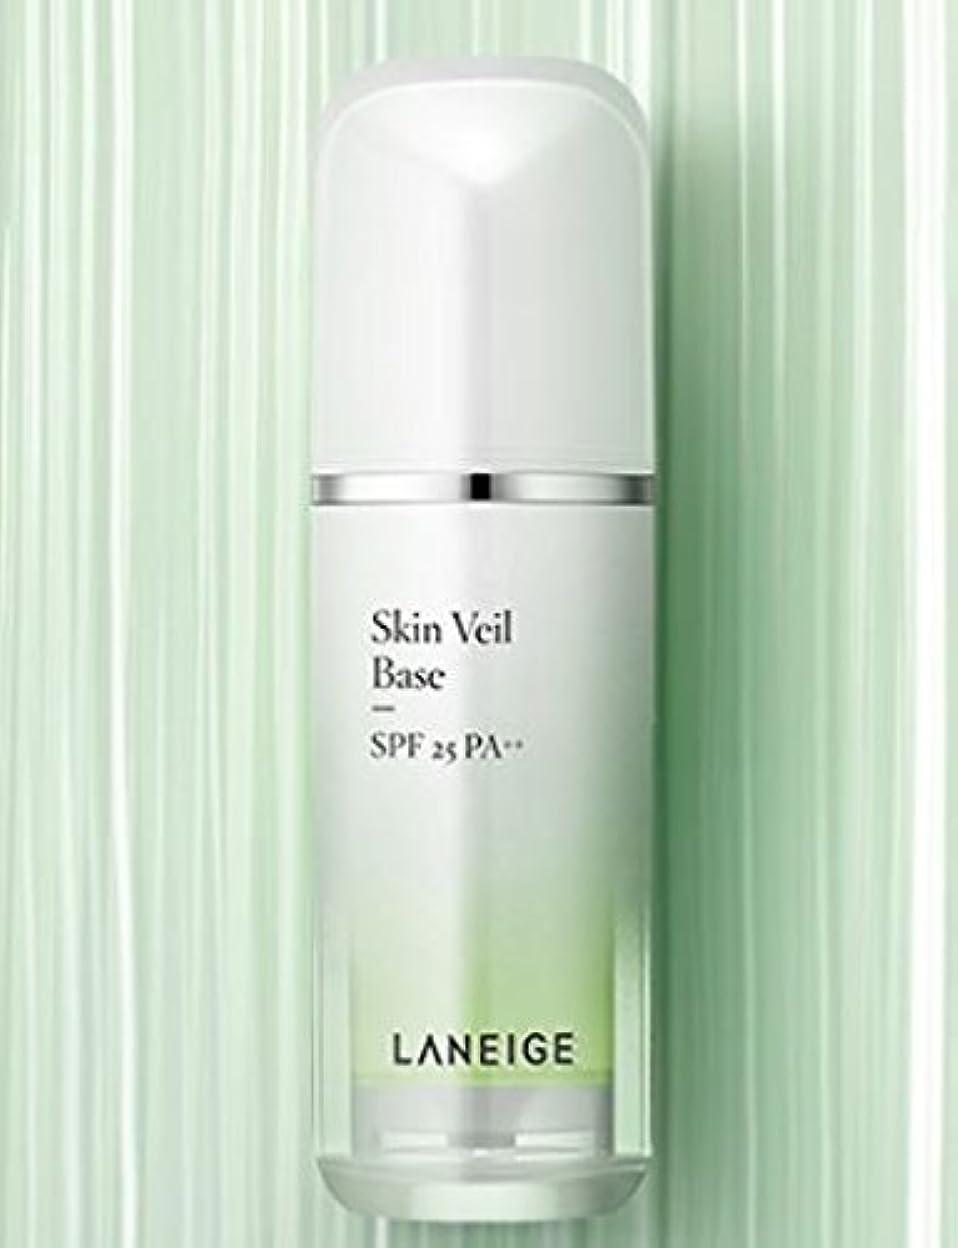 [LANEIGE] Skin Veil Base SPF25 PA++ 30ml/[ラネージュ]スキンベールベース SPF25 PA++ 30ml (# 60 Mint Green/ミントグリーン) [並行輸入品]